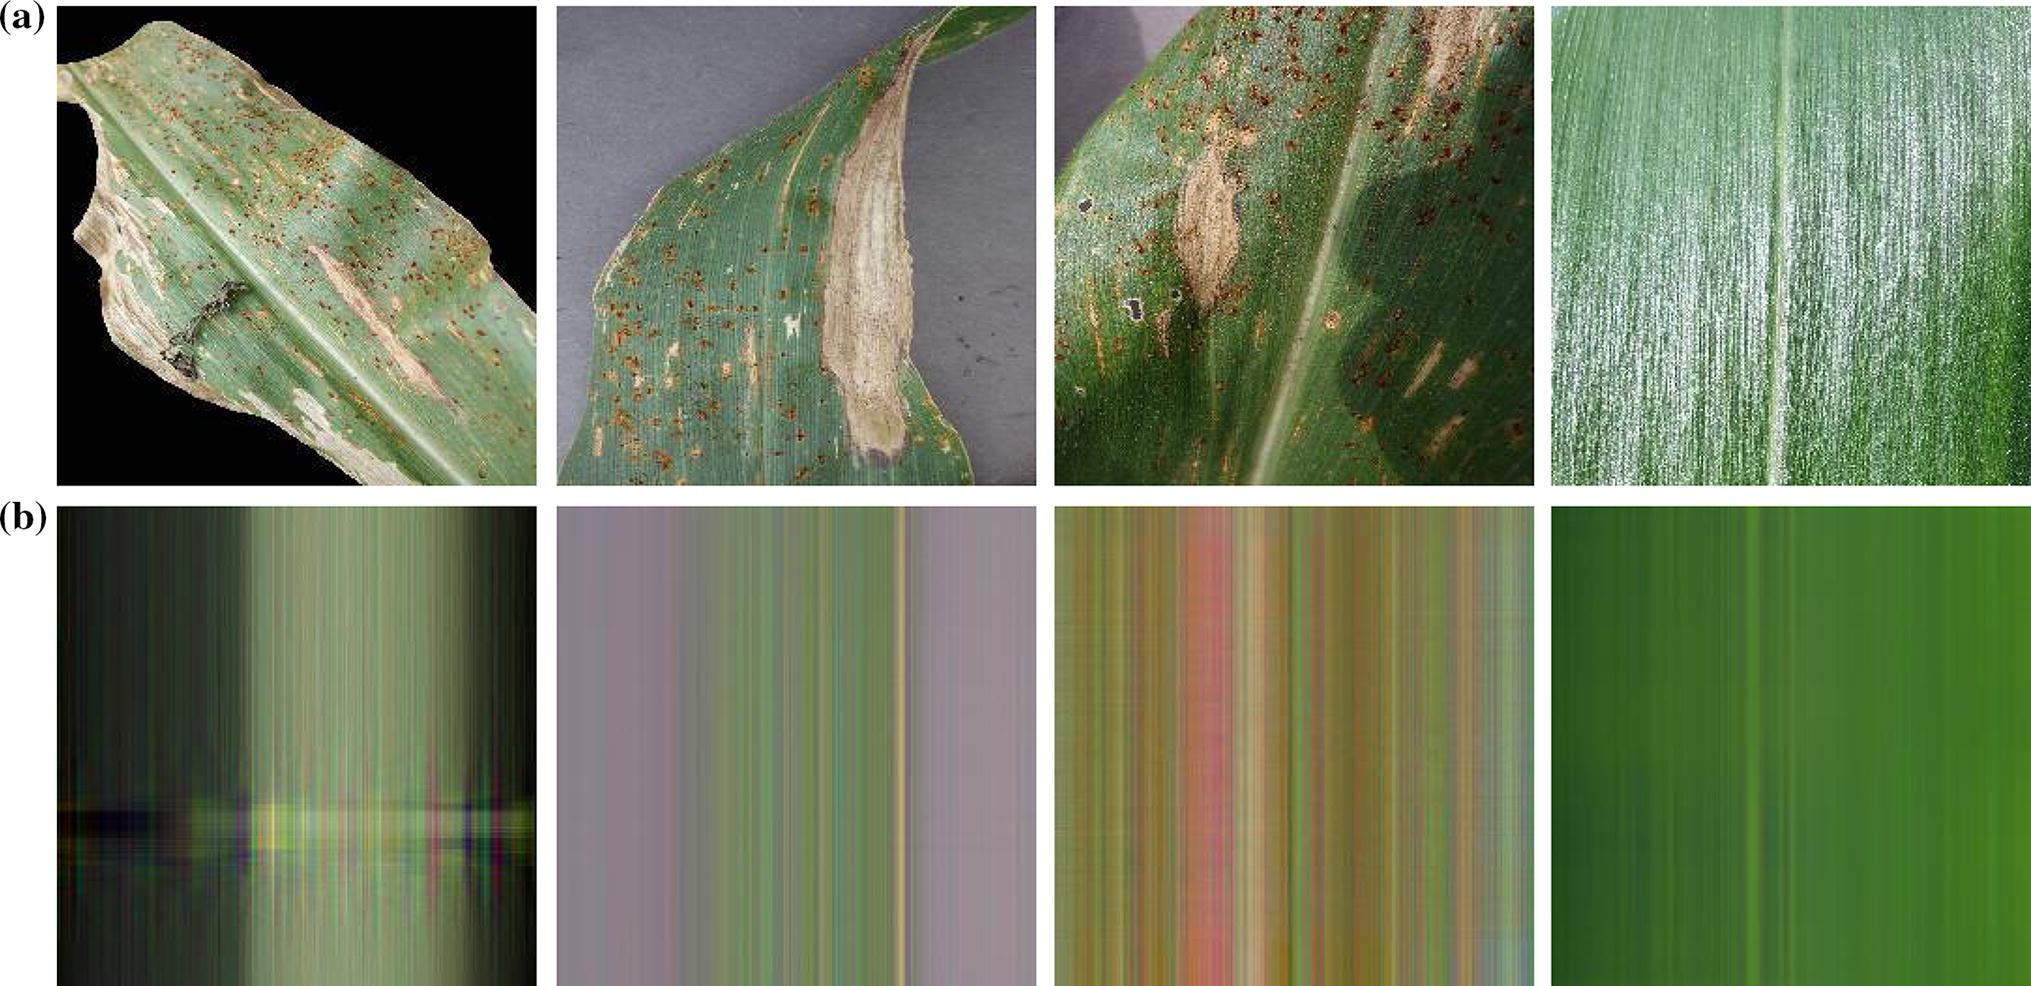 Maize leaf disease classification using deep convolutional